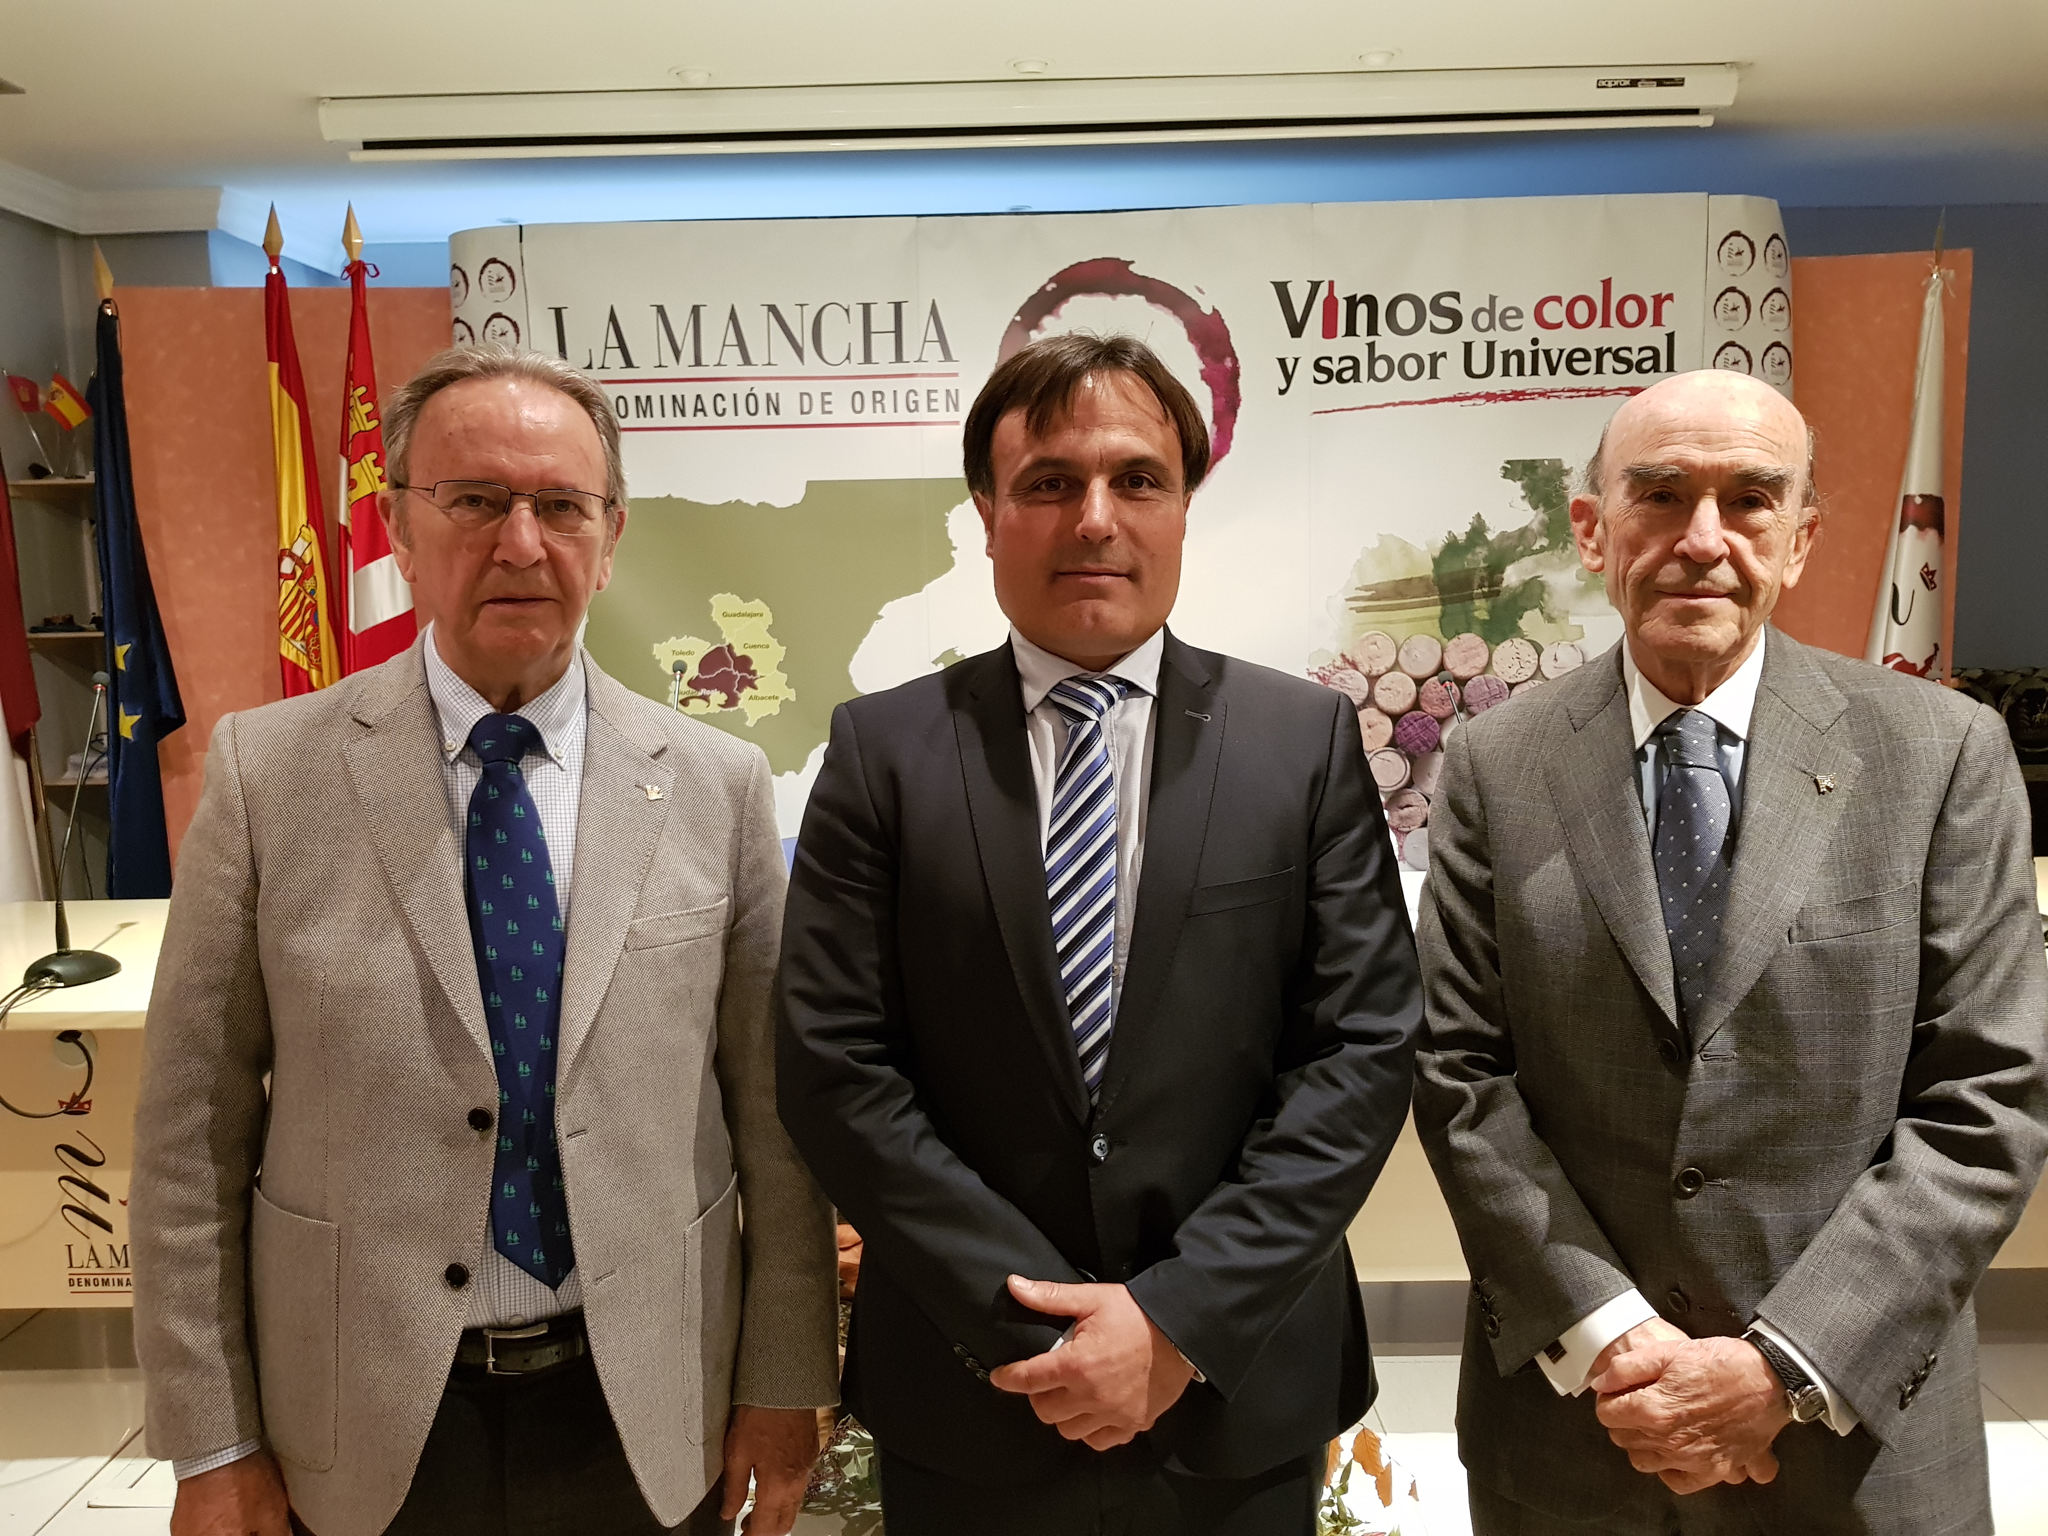 https://blog.globalcaja.es/wp-content/uploads/2019/03/Premios-DO-LA-MANCHA.jpeg